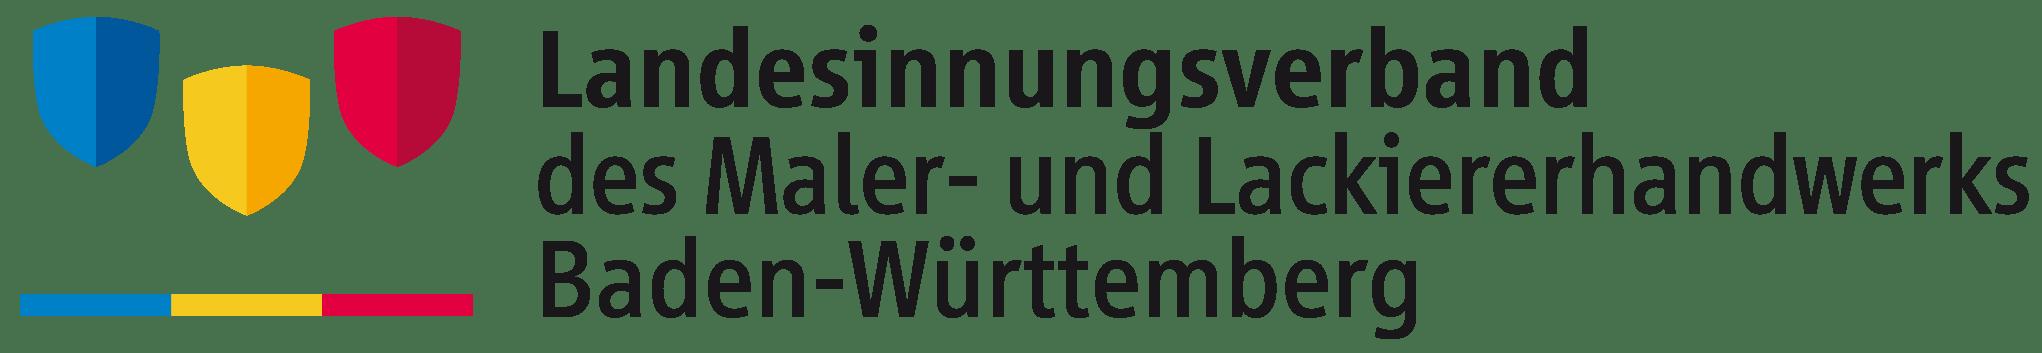 Logo_1_LIV-Bdn-Wrttmbrg_pos.png